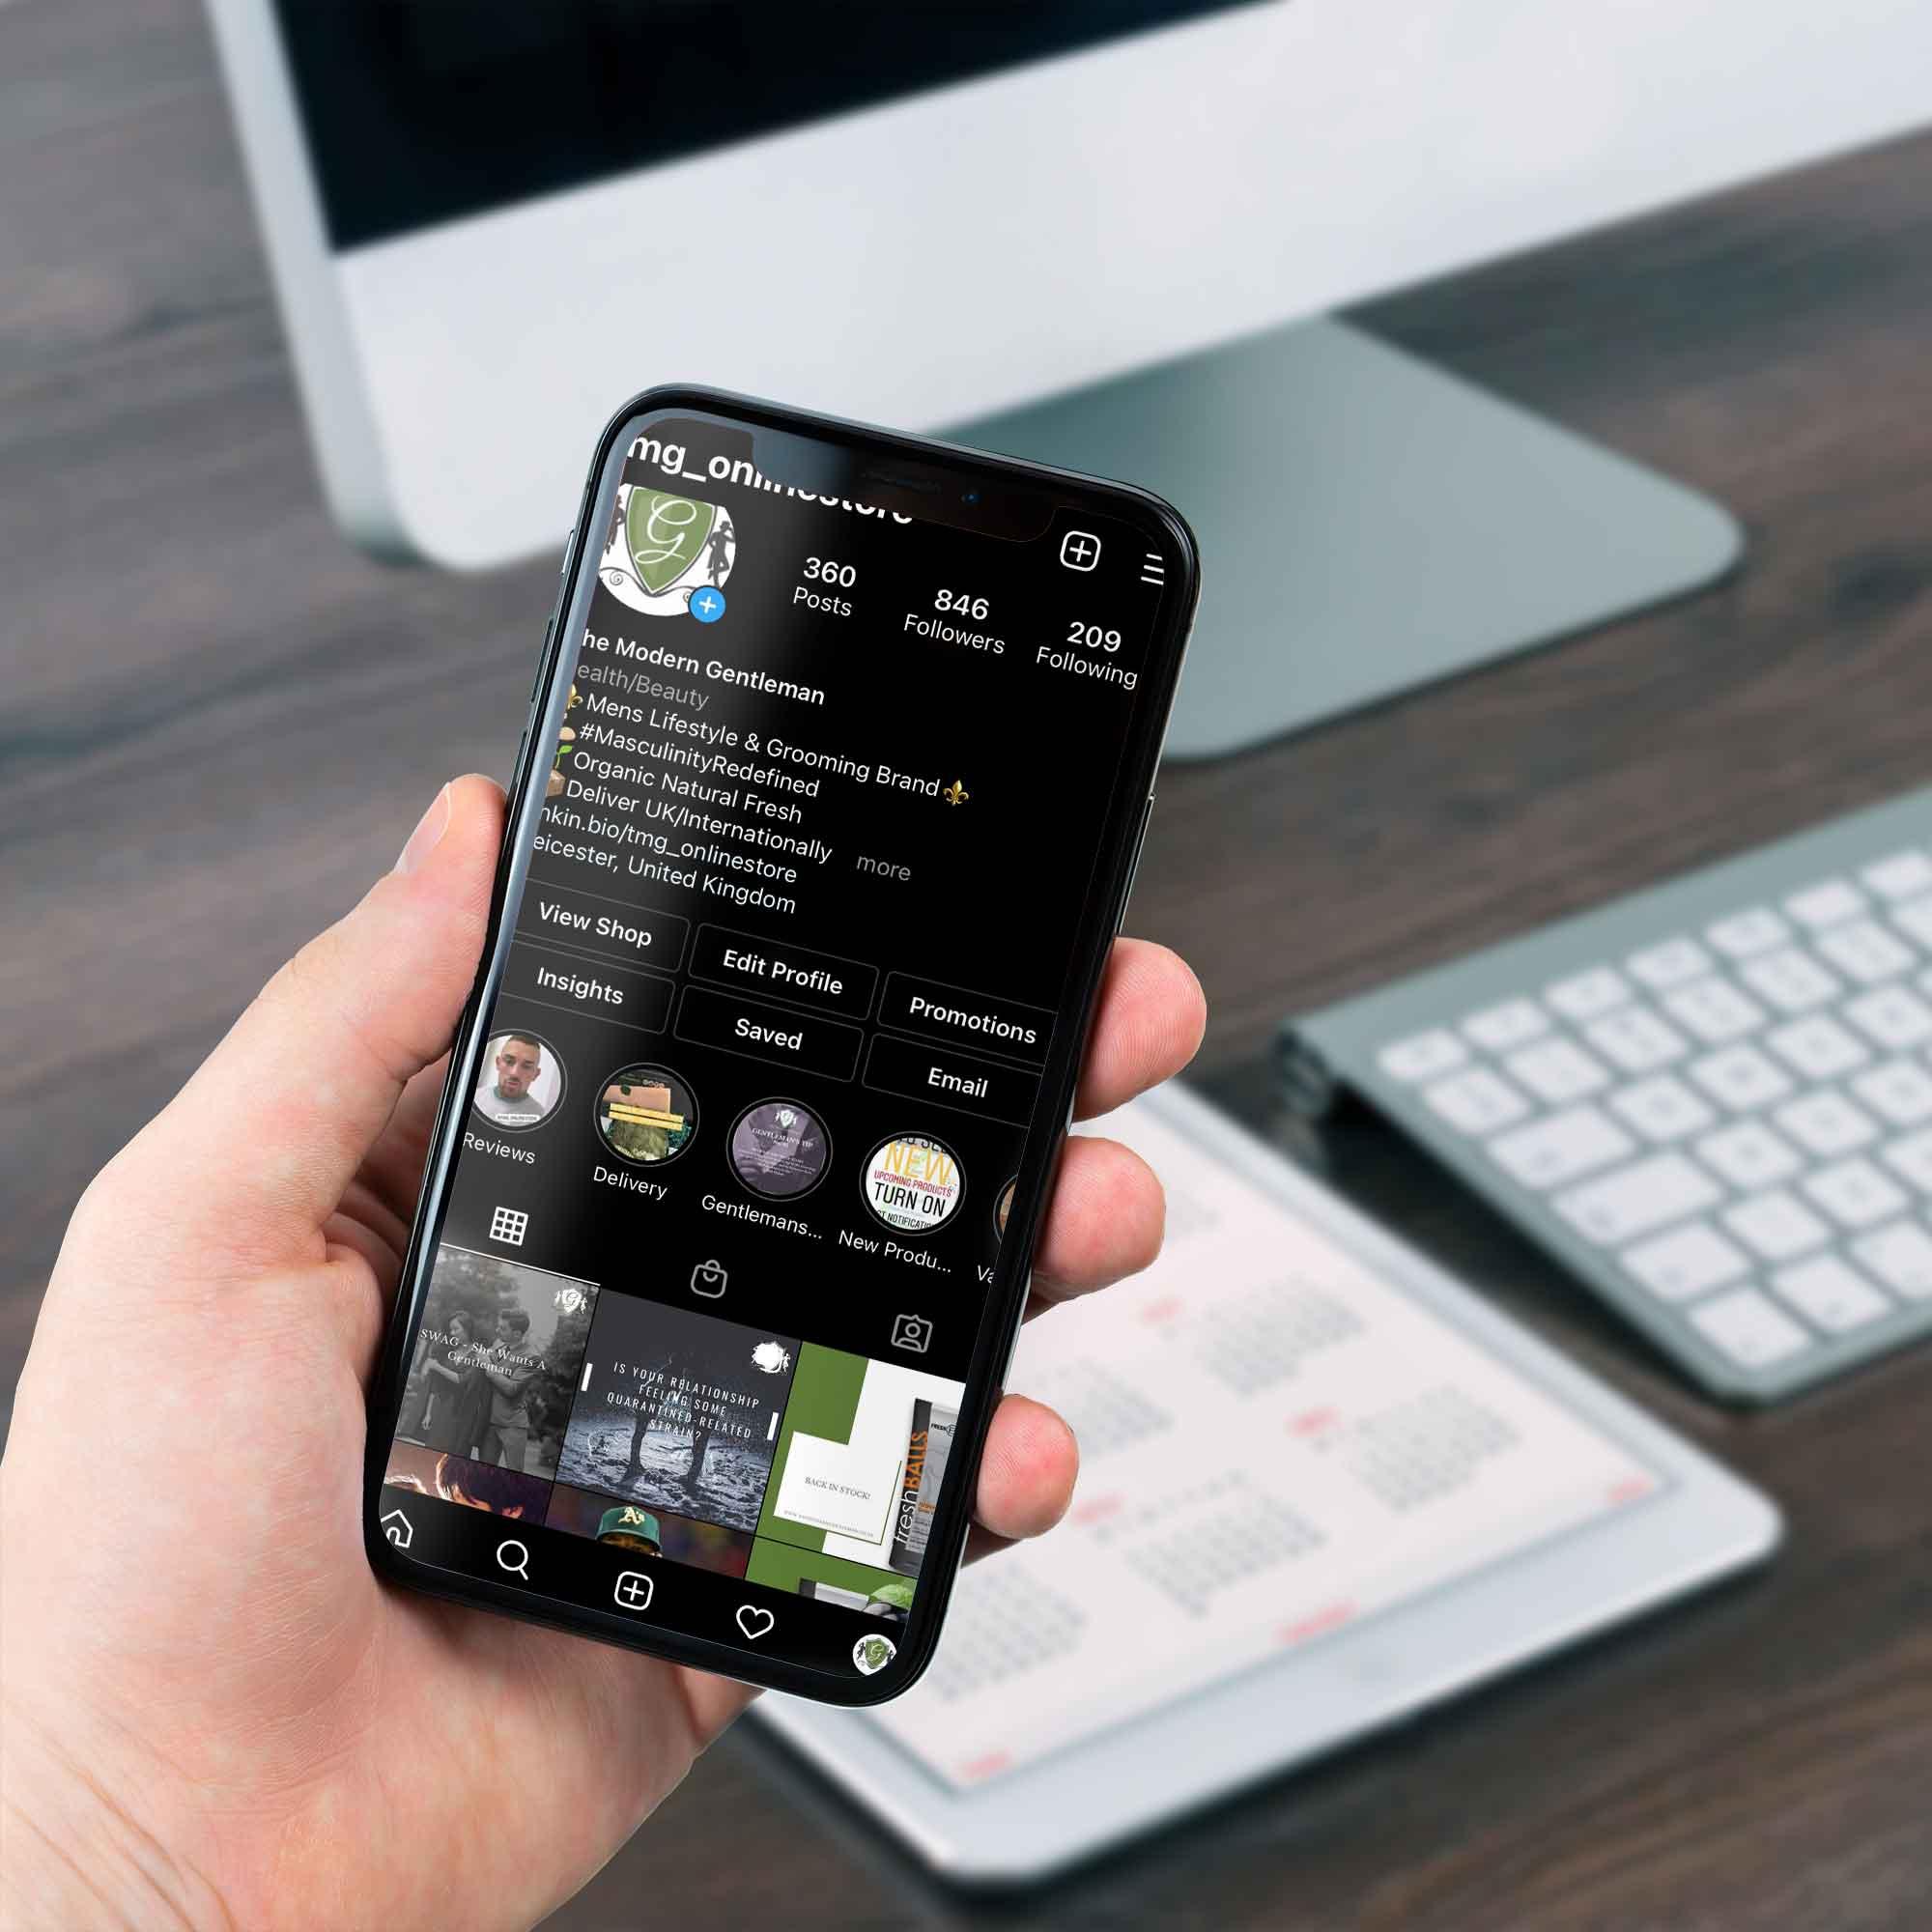 holding-iphone-the-modern-gentleman-instagram-account